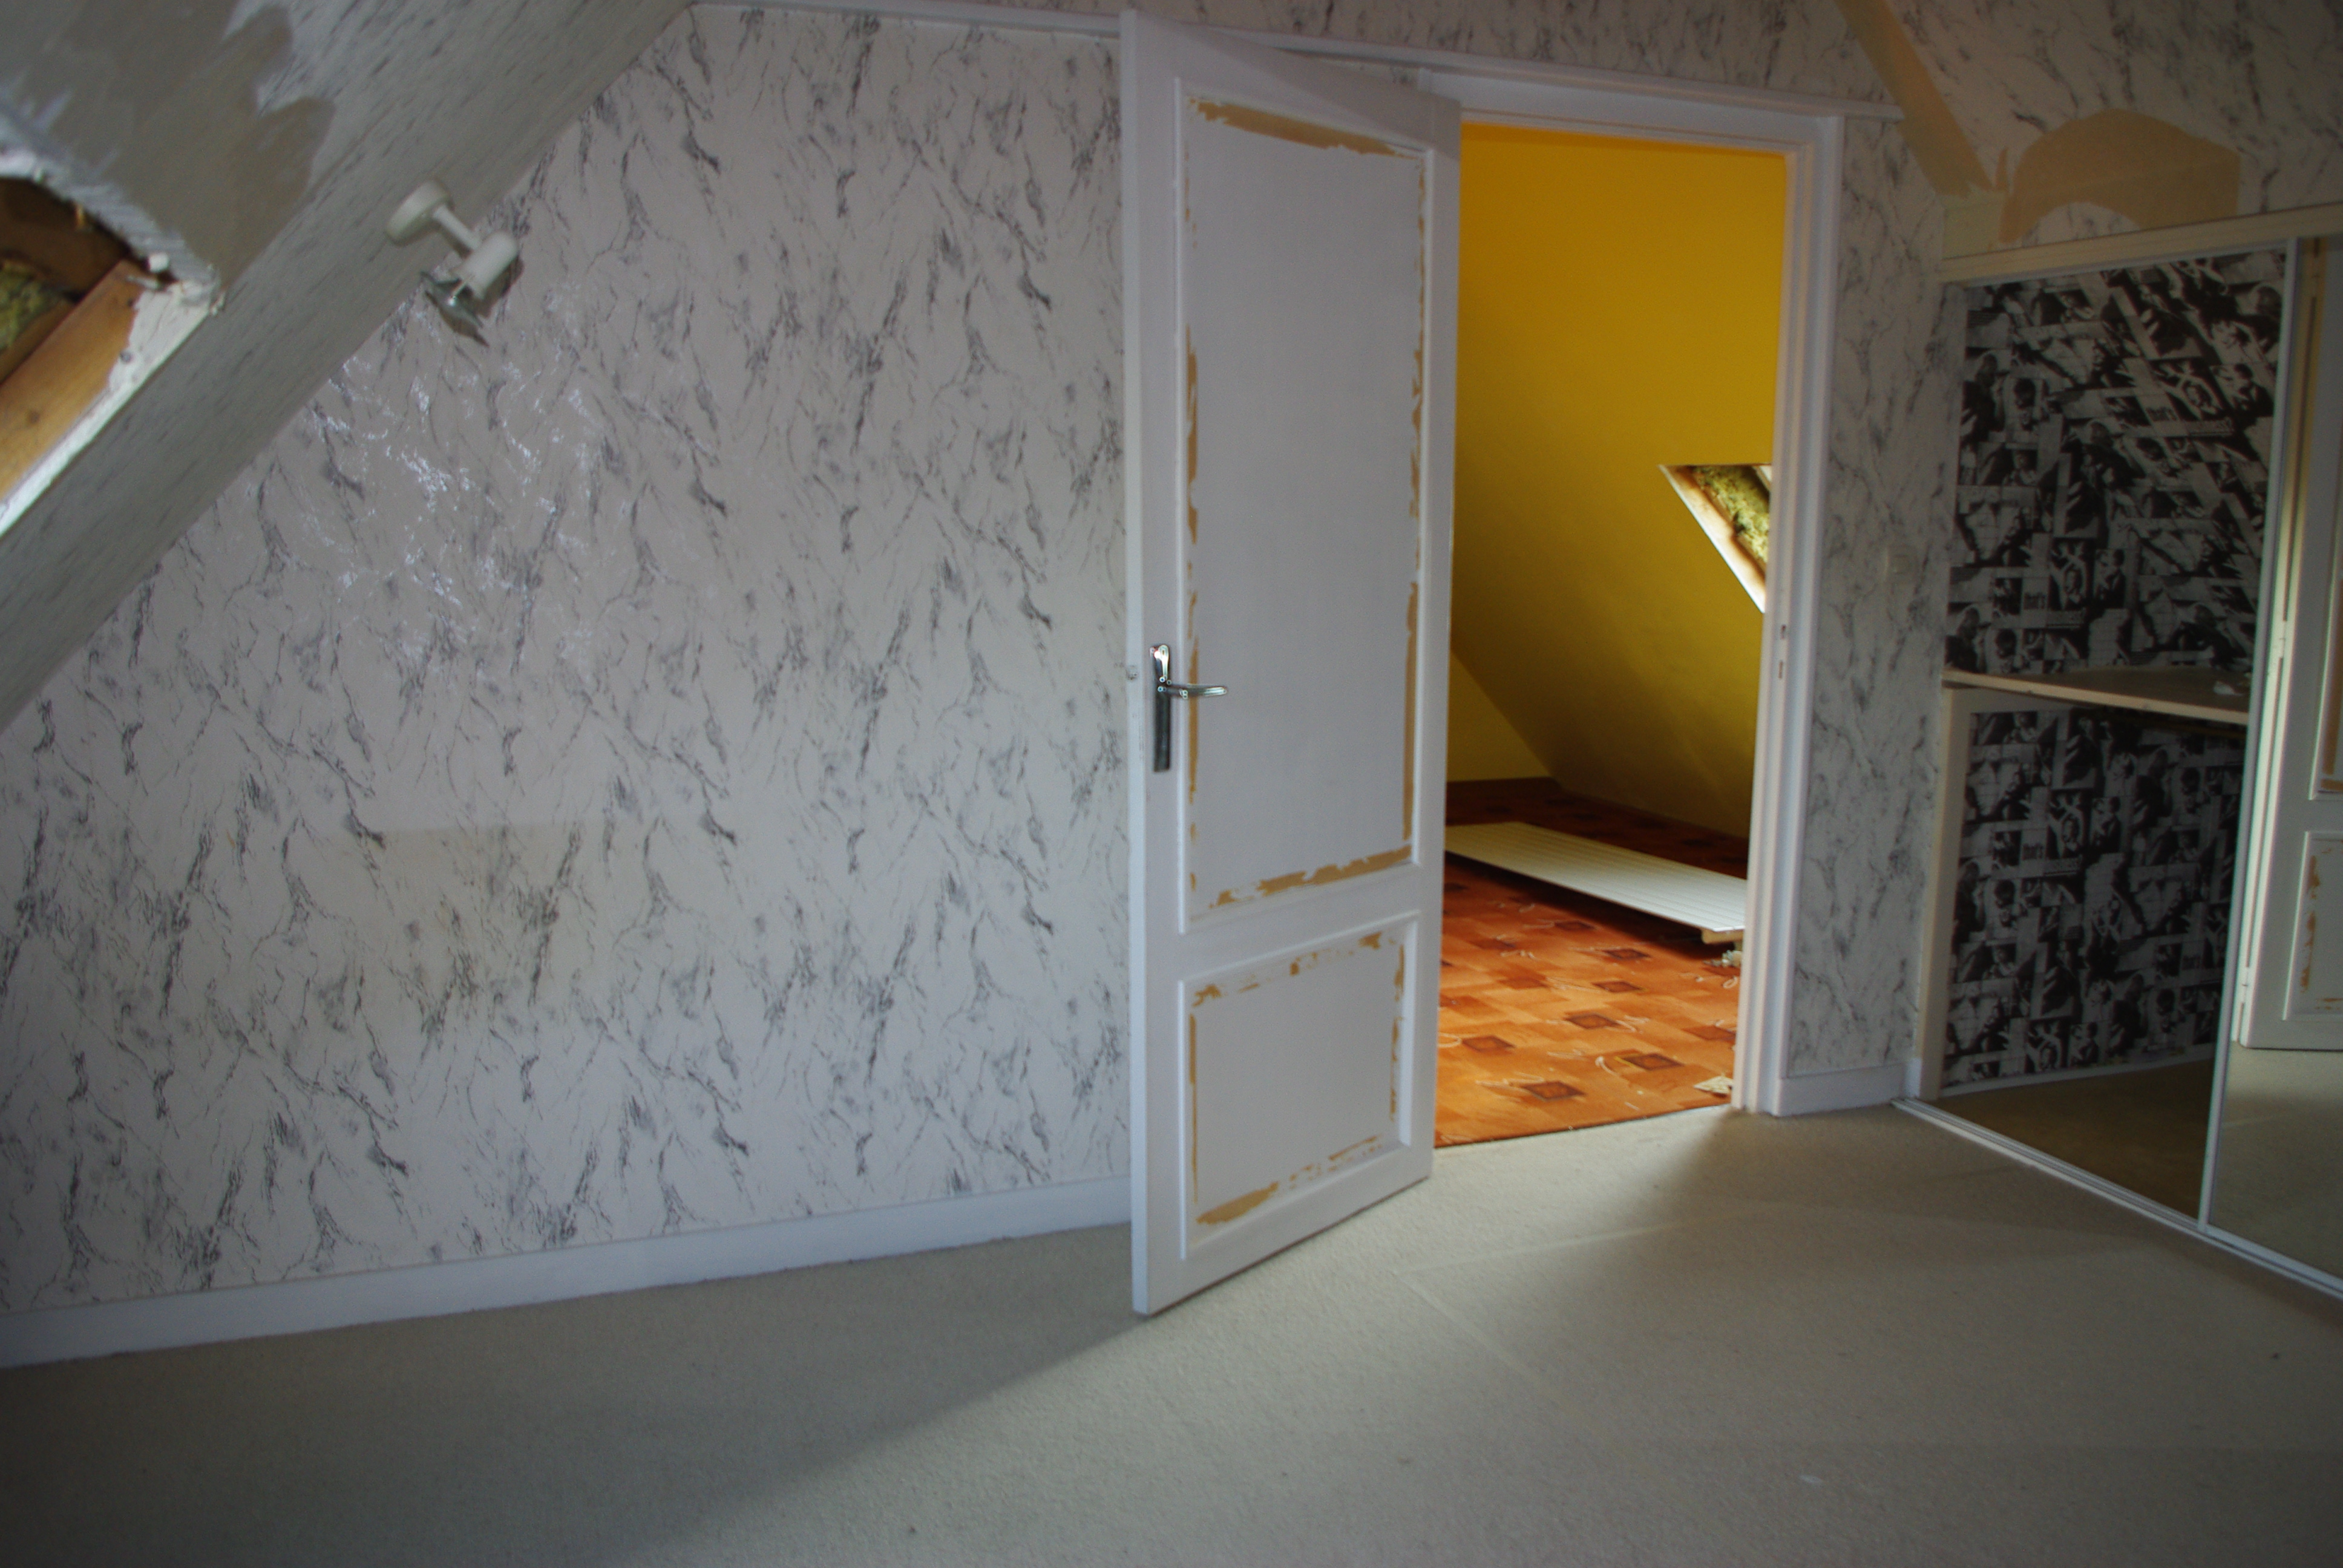 morgane d co tarifs d coration d int rieur. Black Bedroom Furniture Sets. Home Design Ideas